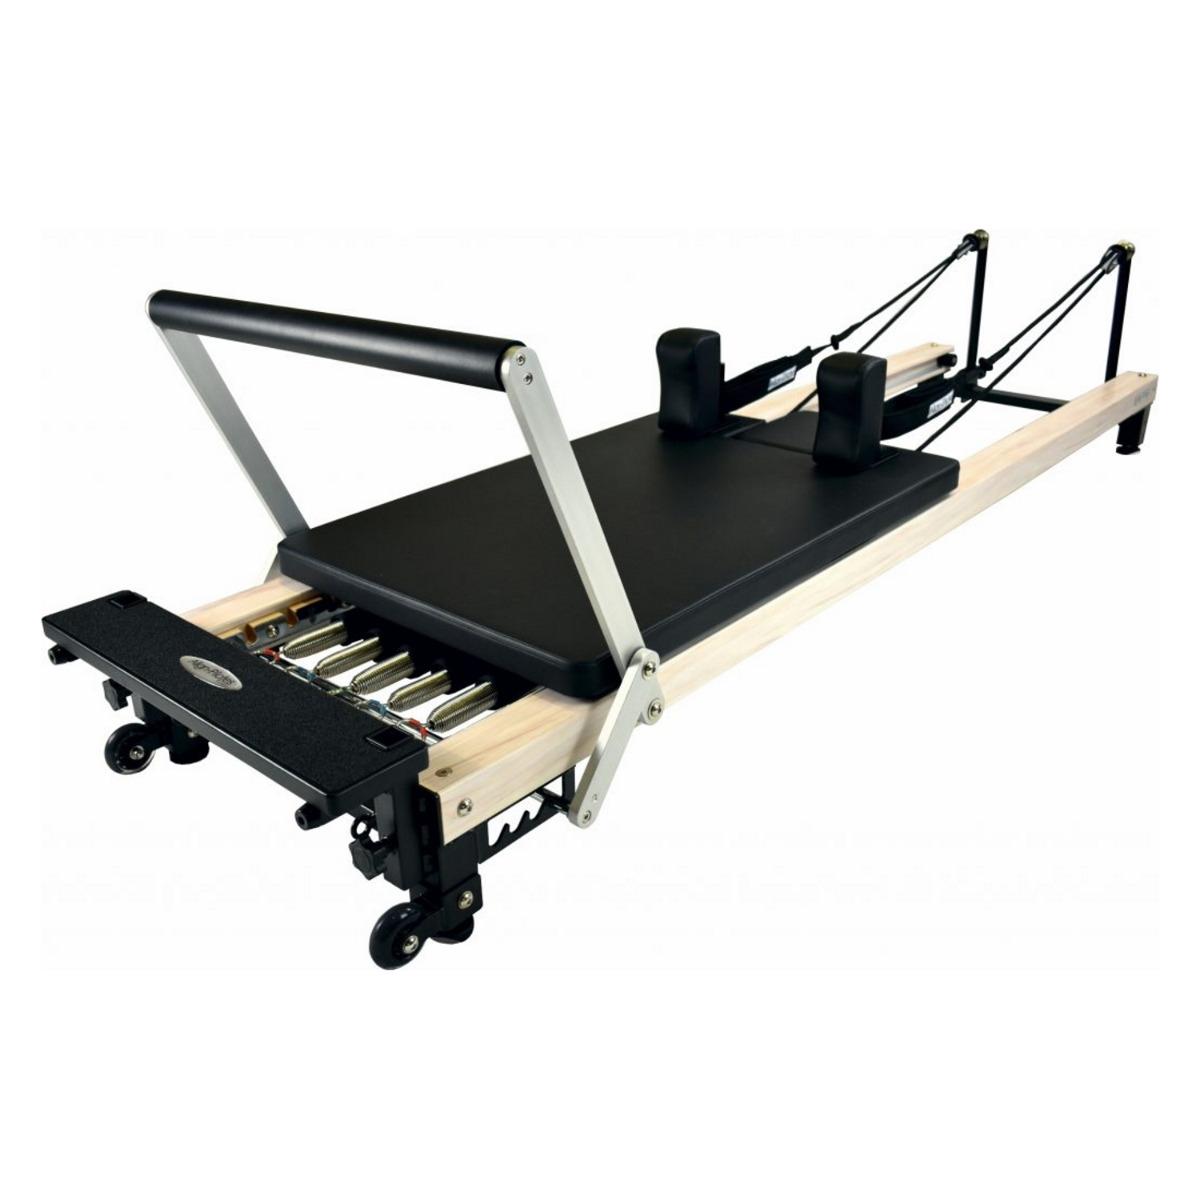 Align-Pilates C2-Pro Reformer Wood Effect